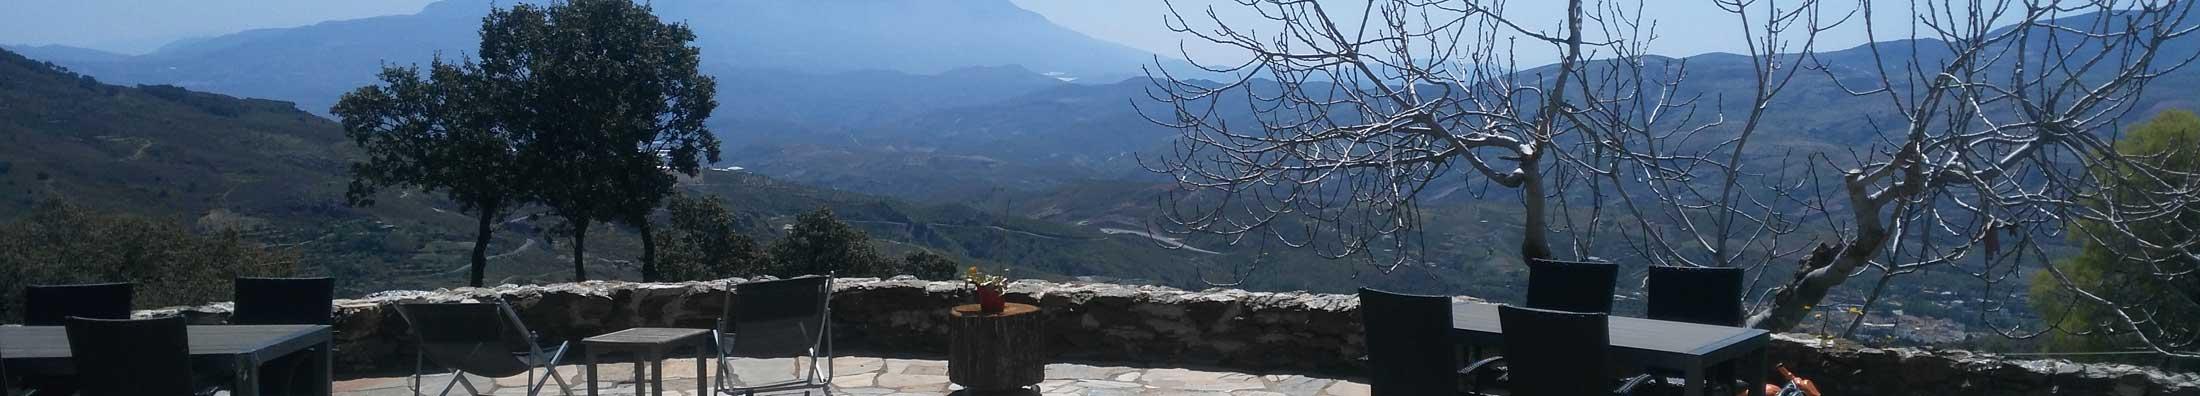 Beste Bed and Breakfast - Spanje - Andalusië - Granada - Bérchules - El Paraje - topfoto